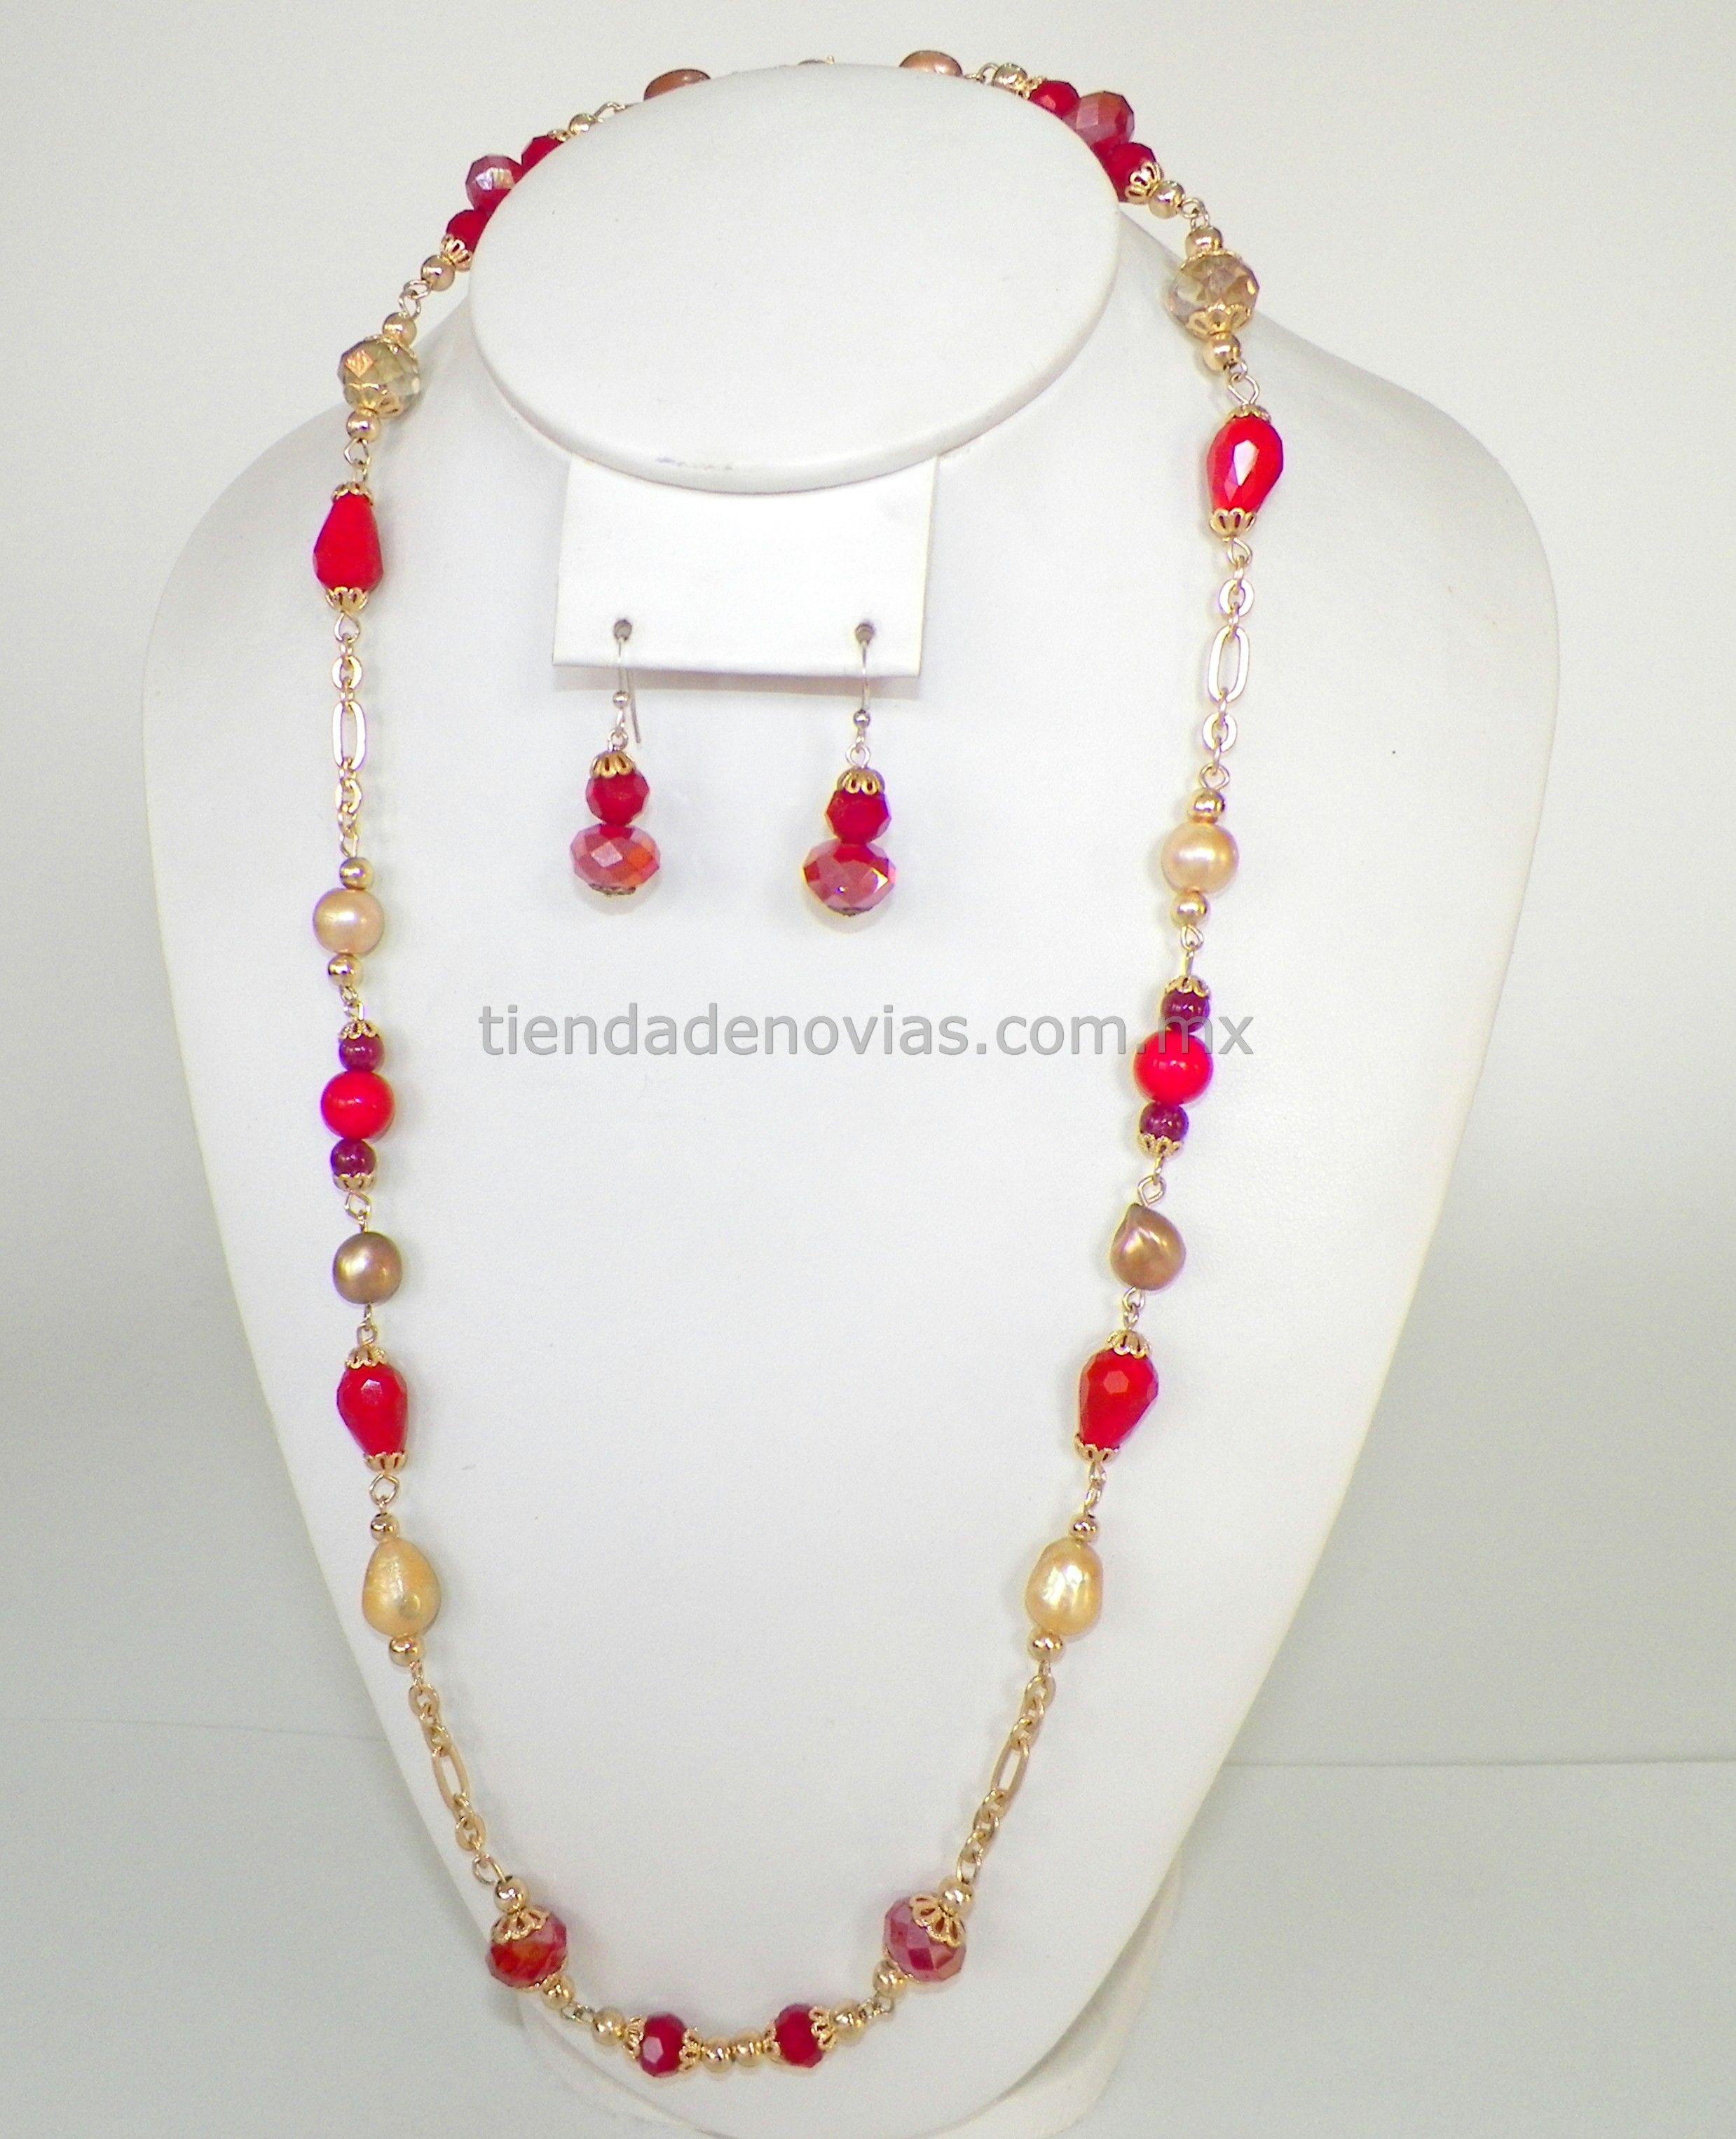 8095765dd49d Collar de Bisuteria fina